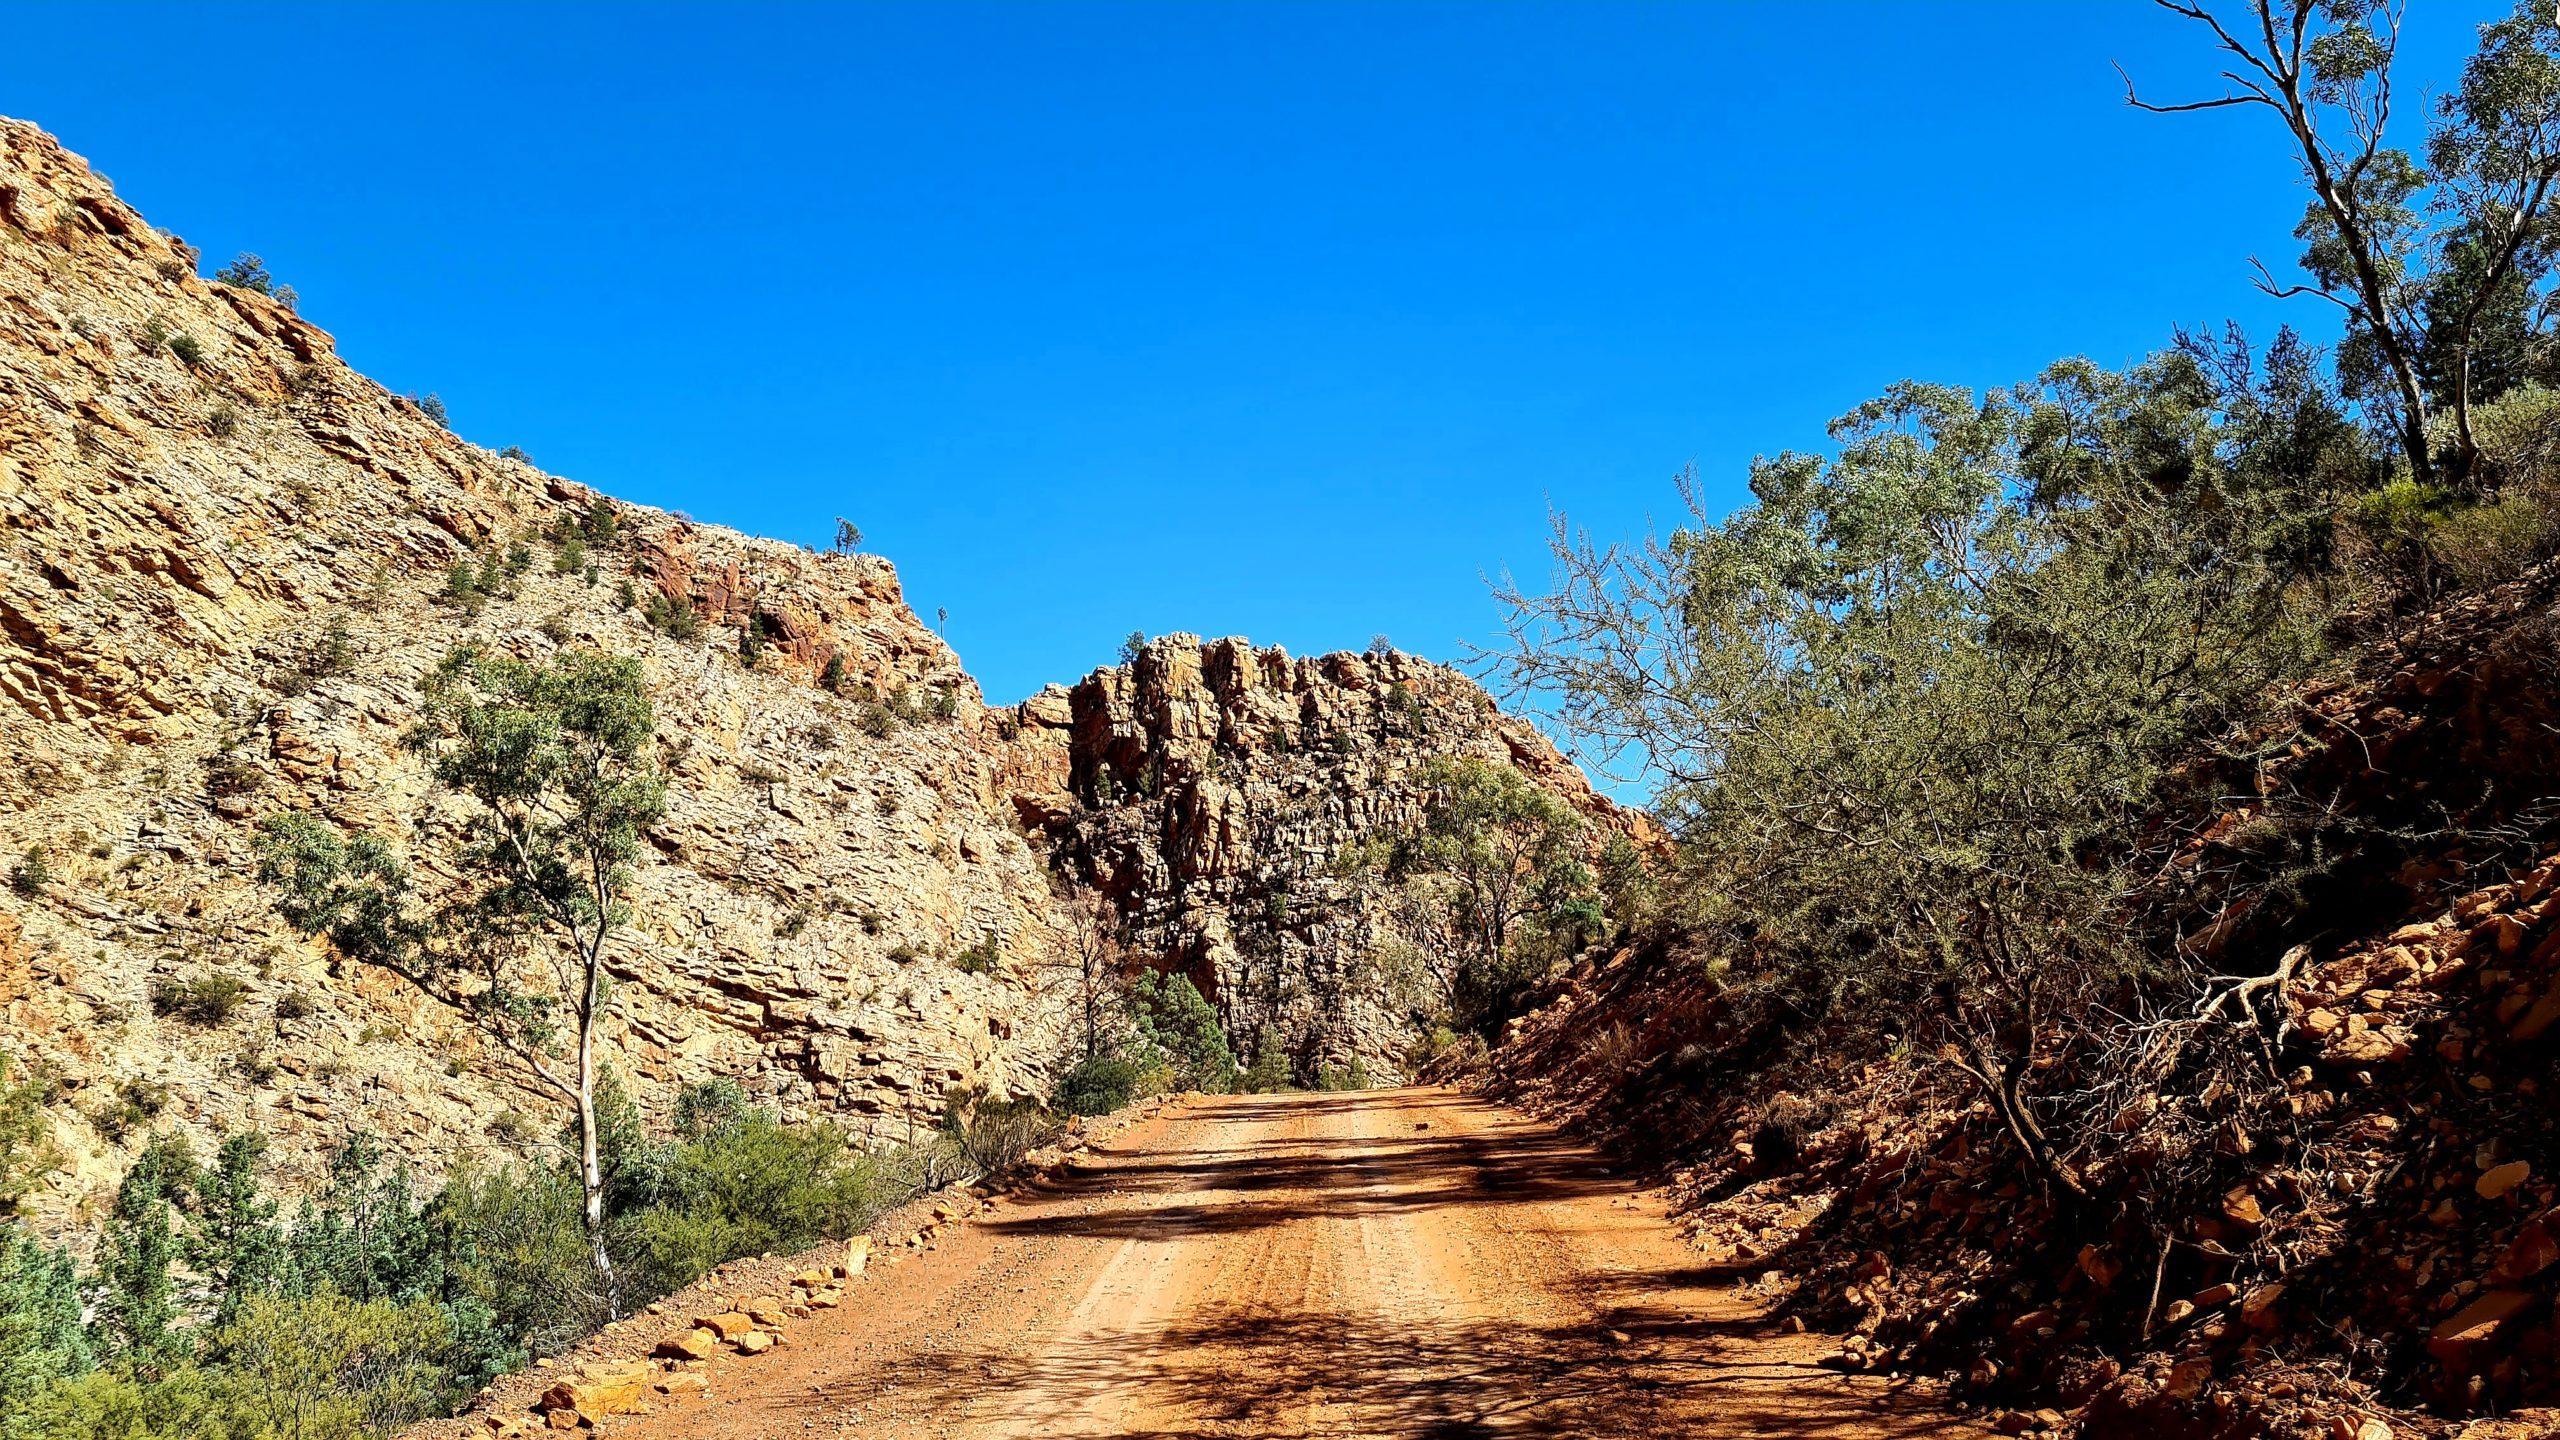 Flinders Ranges National Park Scenic Drive